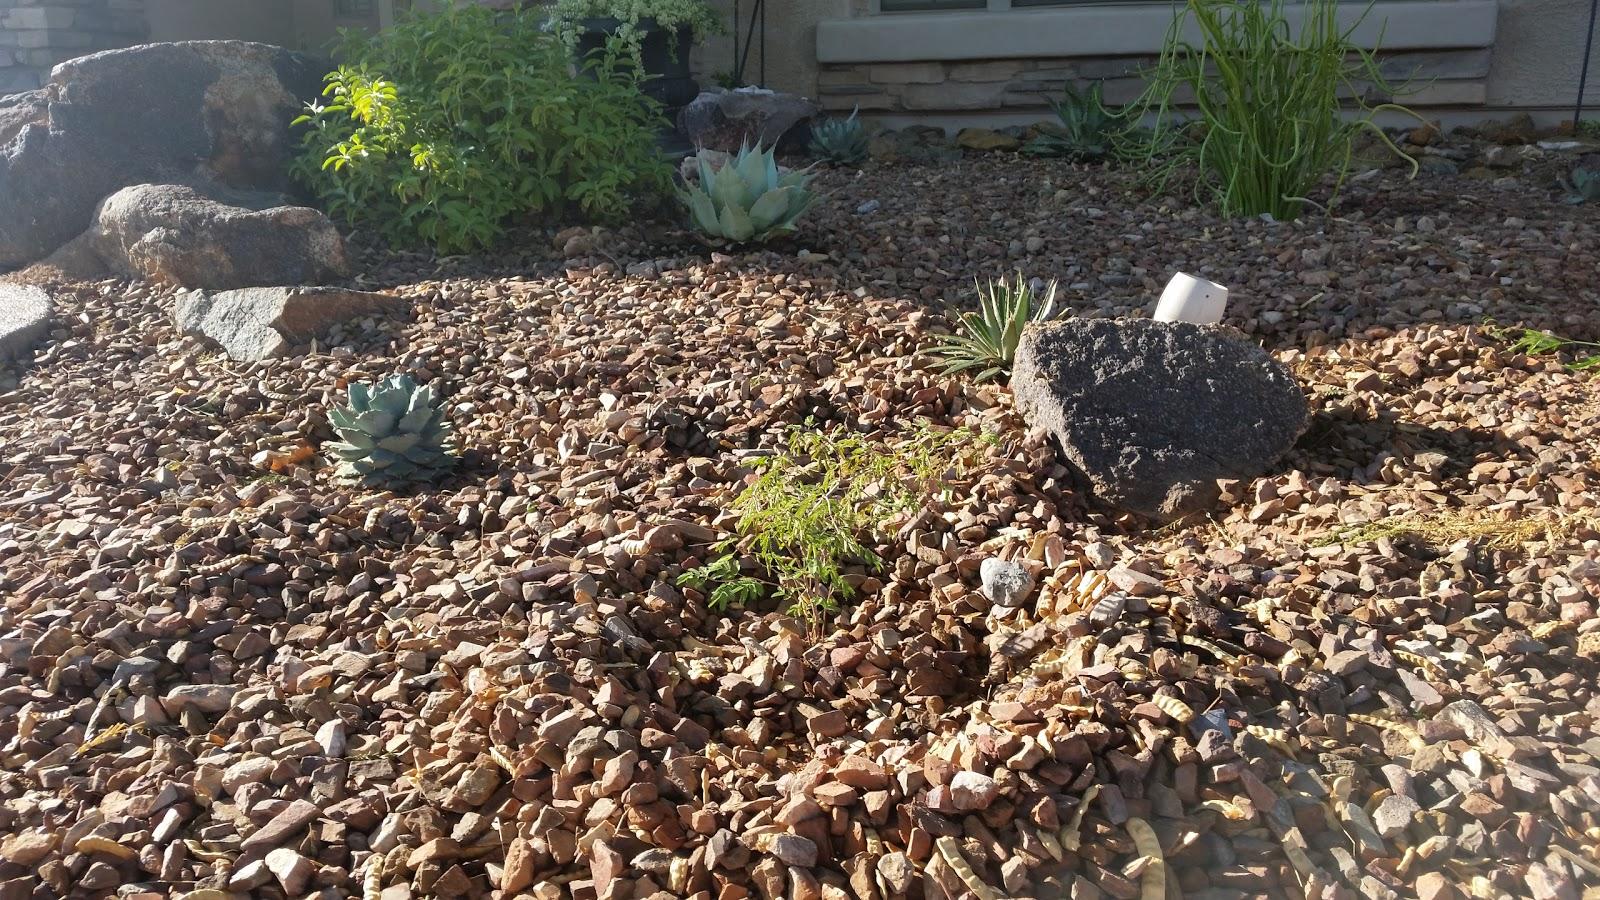 Desert Yard and Garden: Labor Day Planting